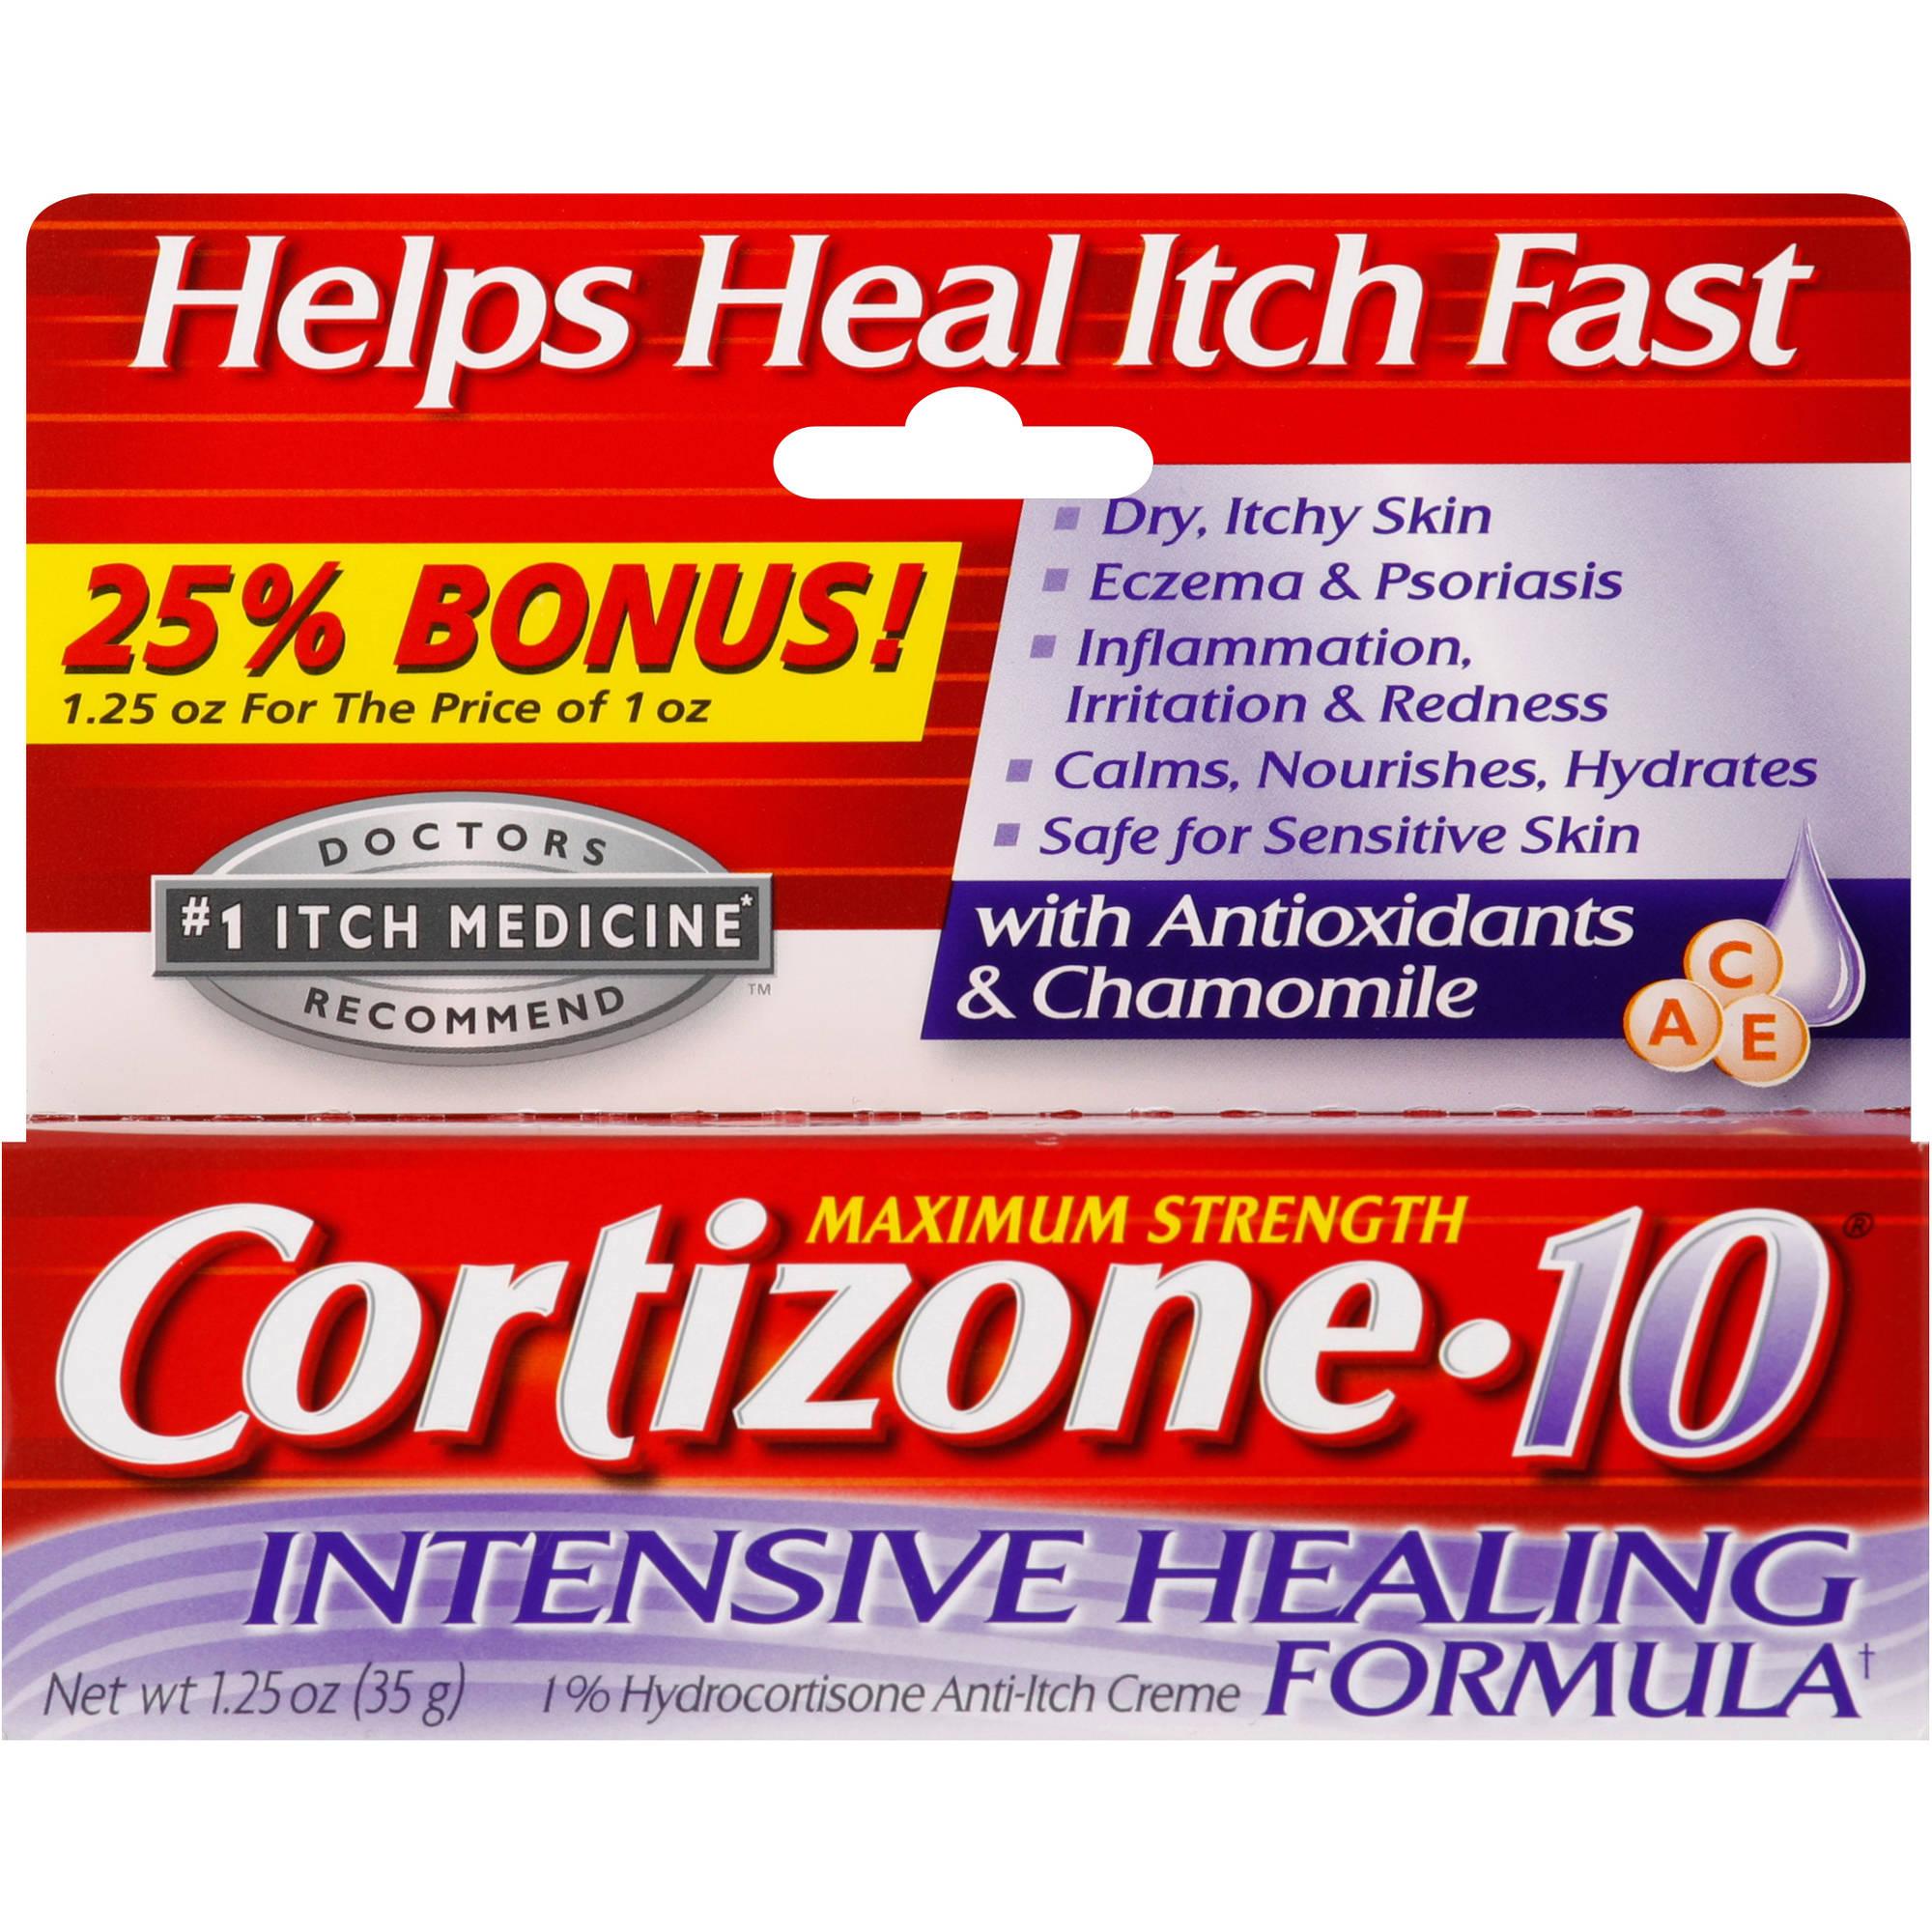 Cortizone-10 Maximum Strength Intensive Healing Formula 1% Hydrocortisone Anti-Itch Creme with Antioxidants & Chamomile, 1.25 oz